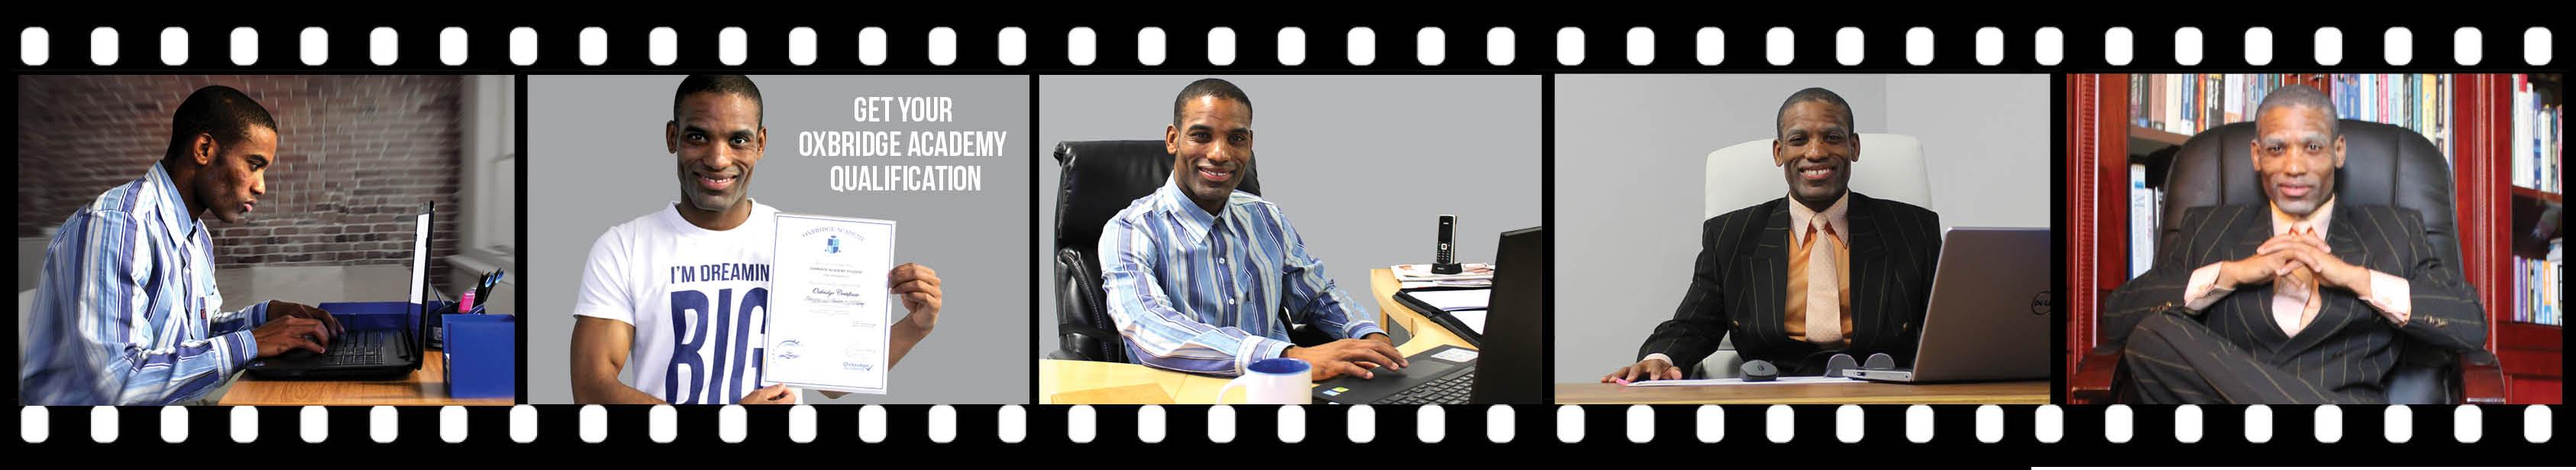 Film strip of successful guy